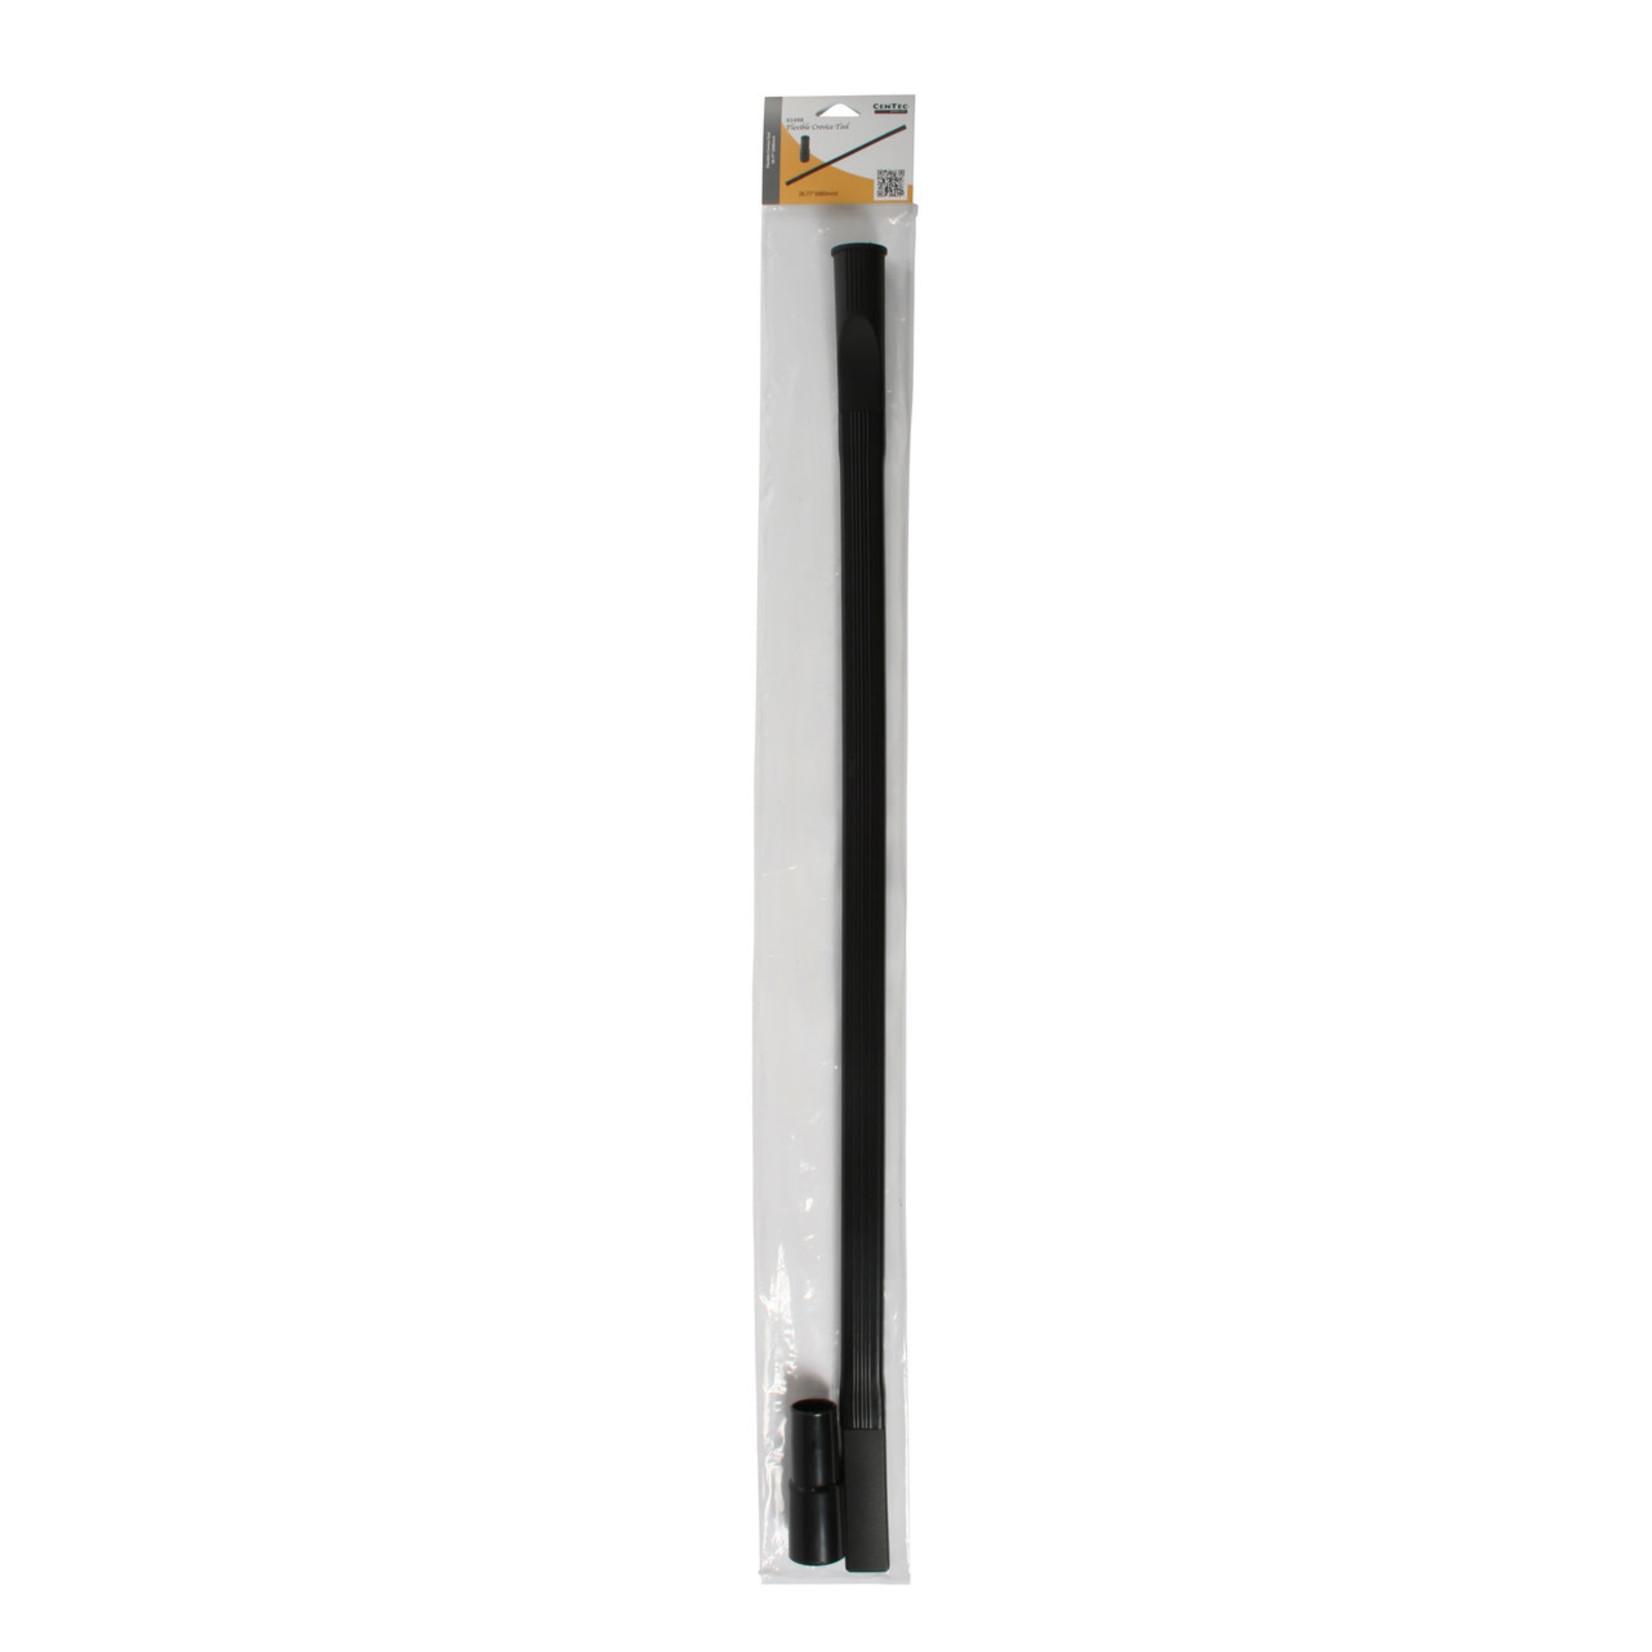 "Centec CenTec Rubber Appliance 36 Inch Crevice Tool - 1.25"" x 36"""